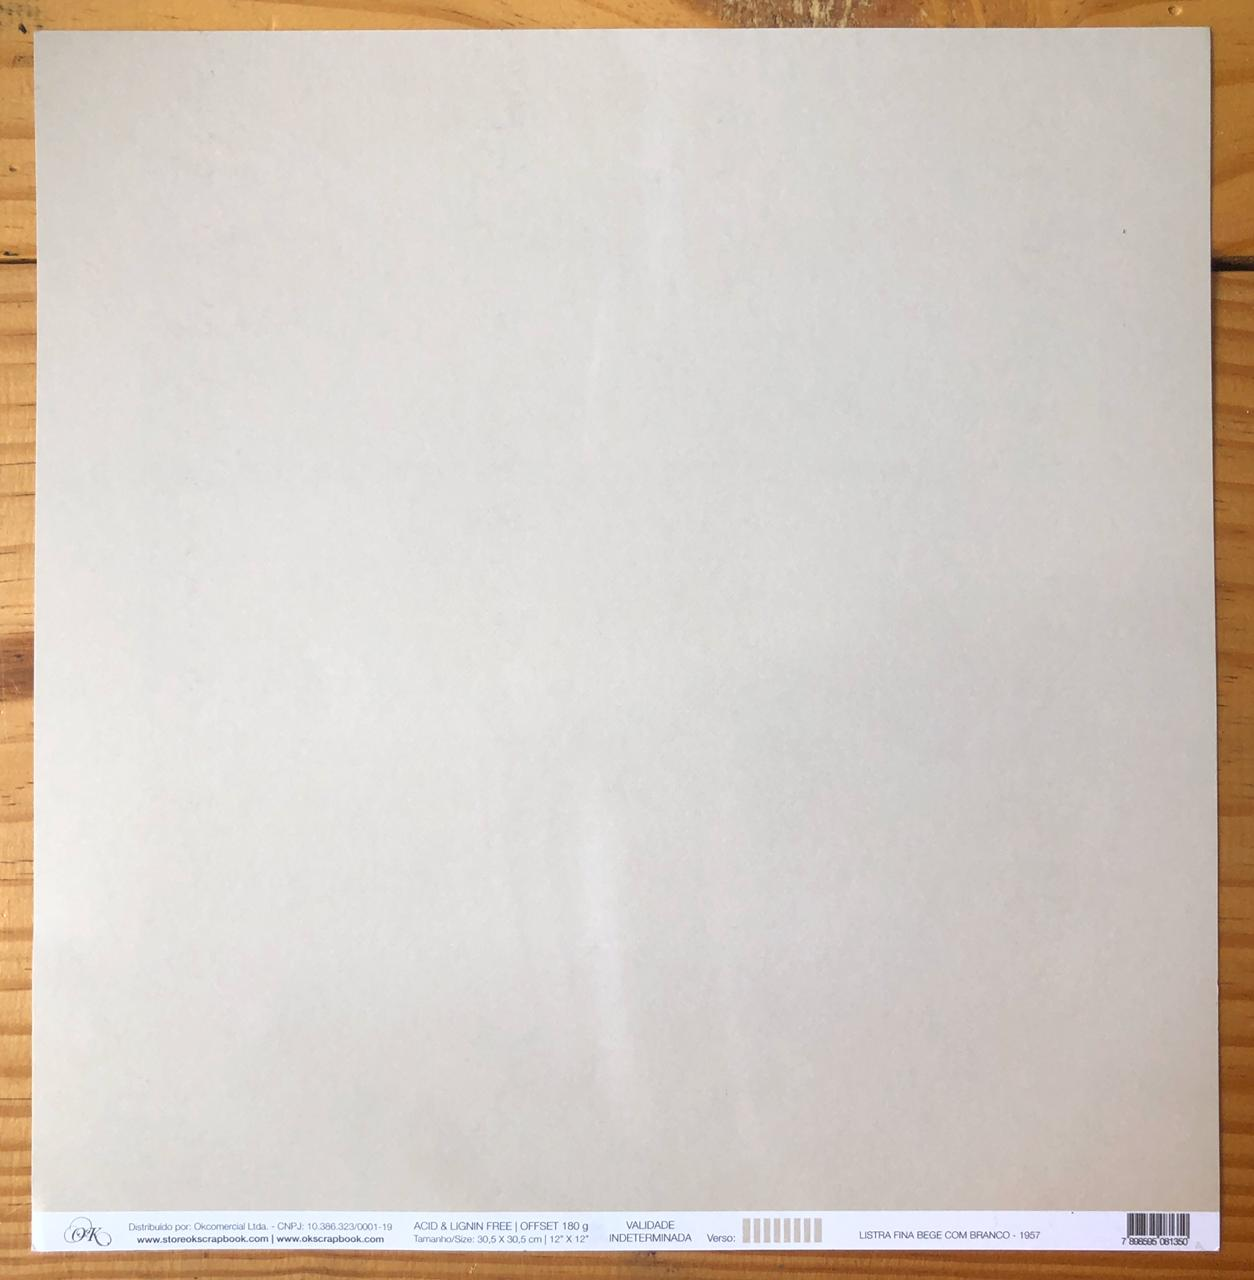 Papel Scrap - Listra Fina Bege com Branco - Ok Scrapbook (1957)